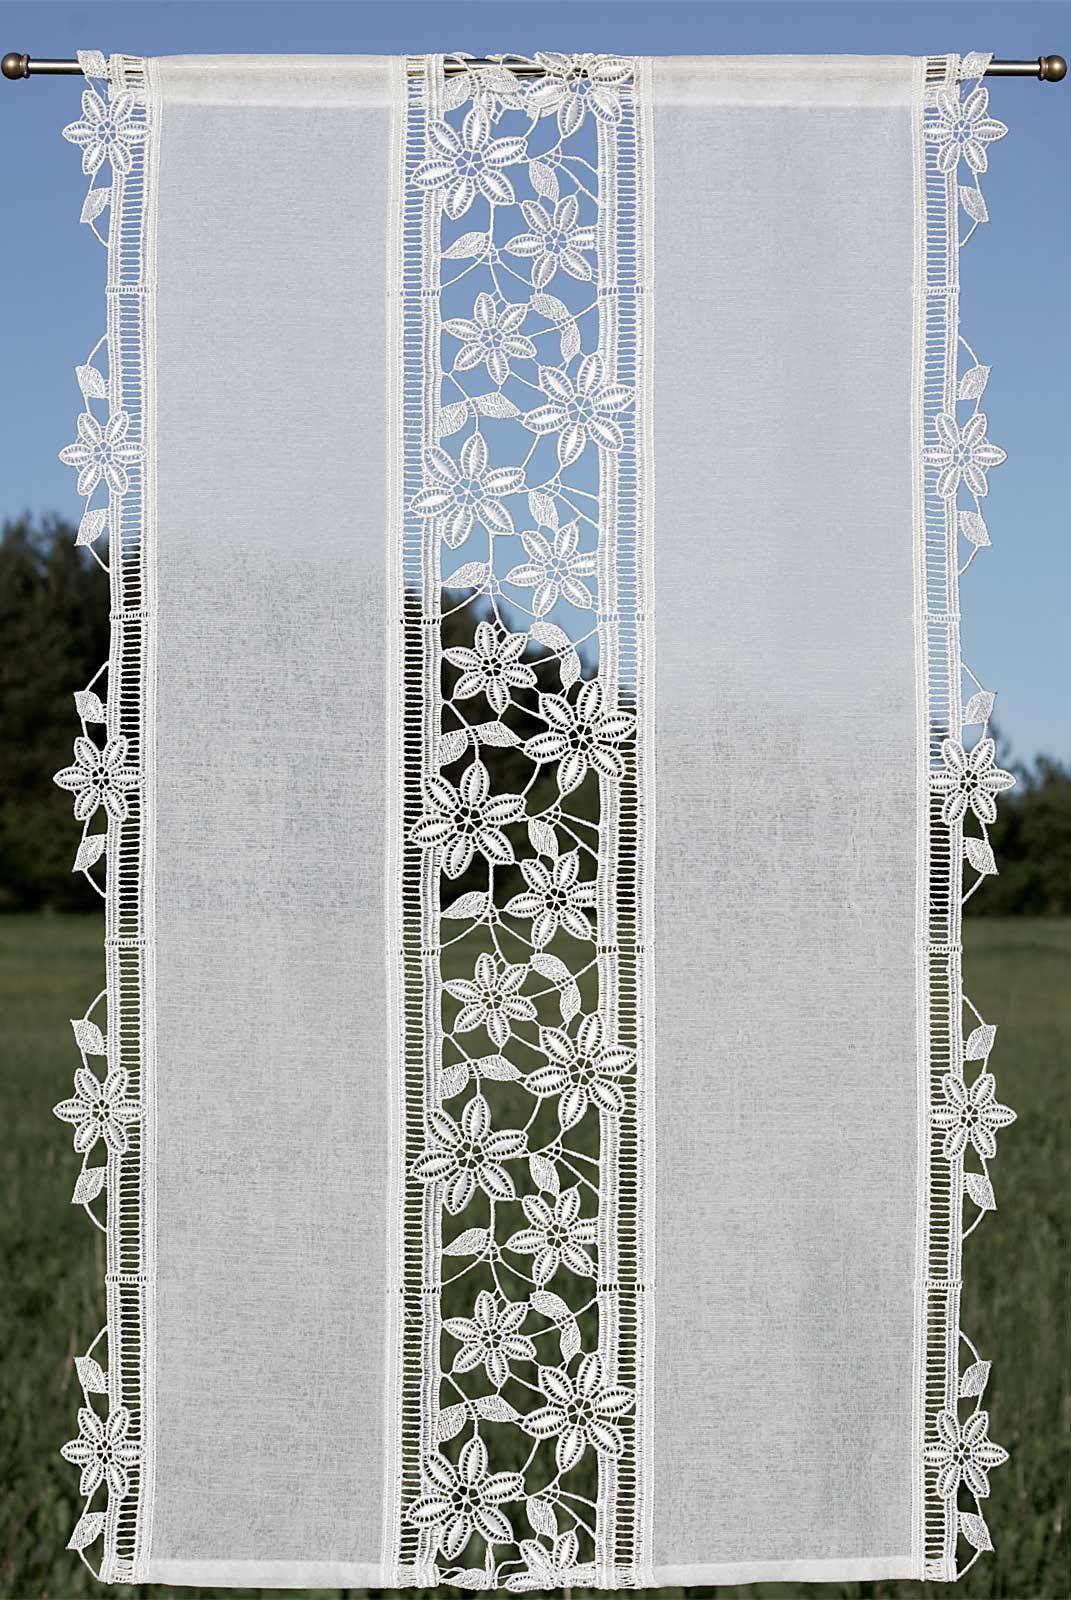 Flächenvorhänge Modern flächenvorhänge modern günstige schiebegardinen plauener spitze